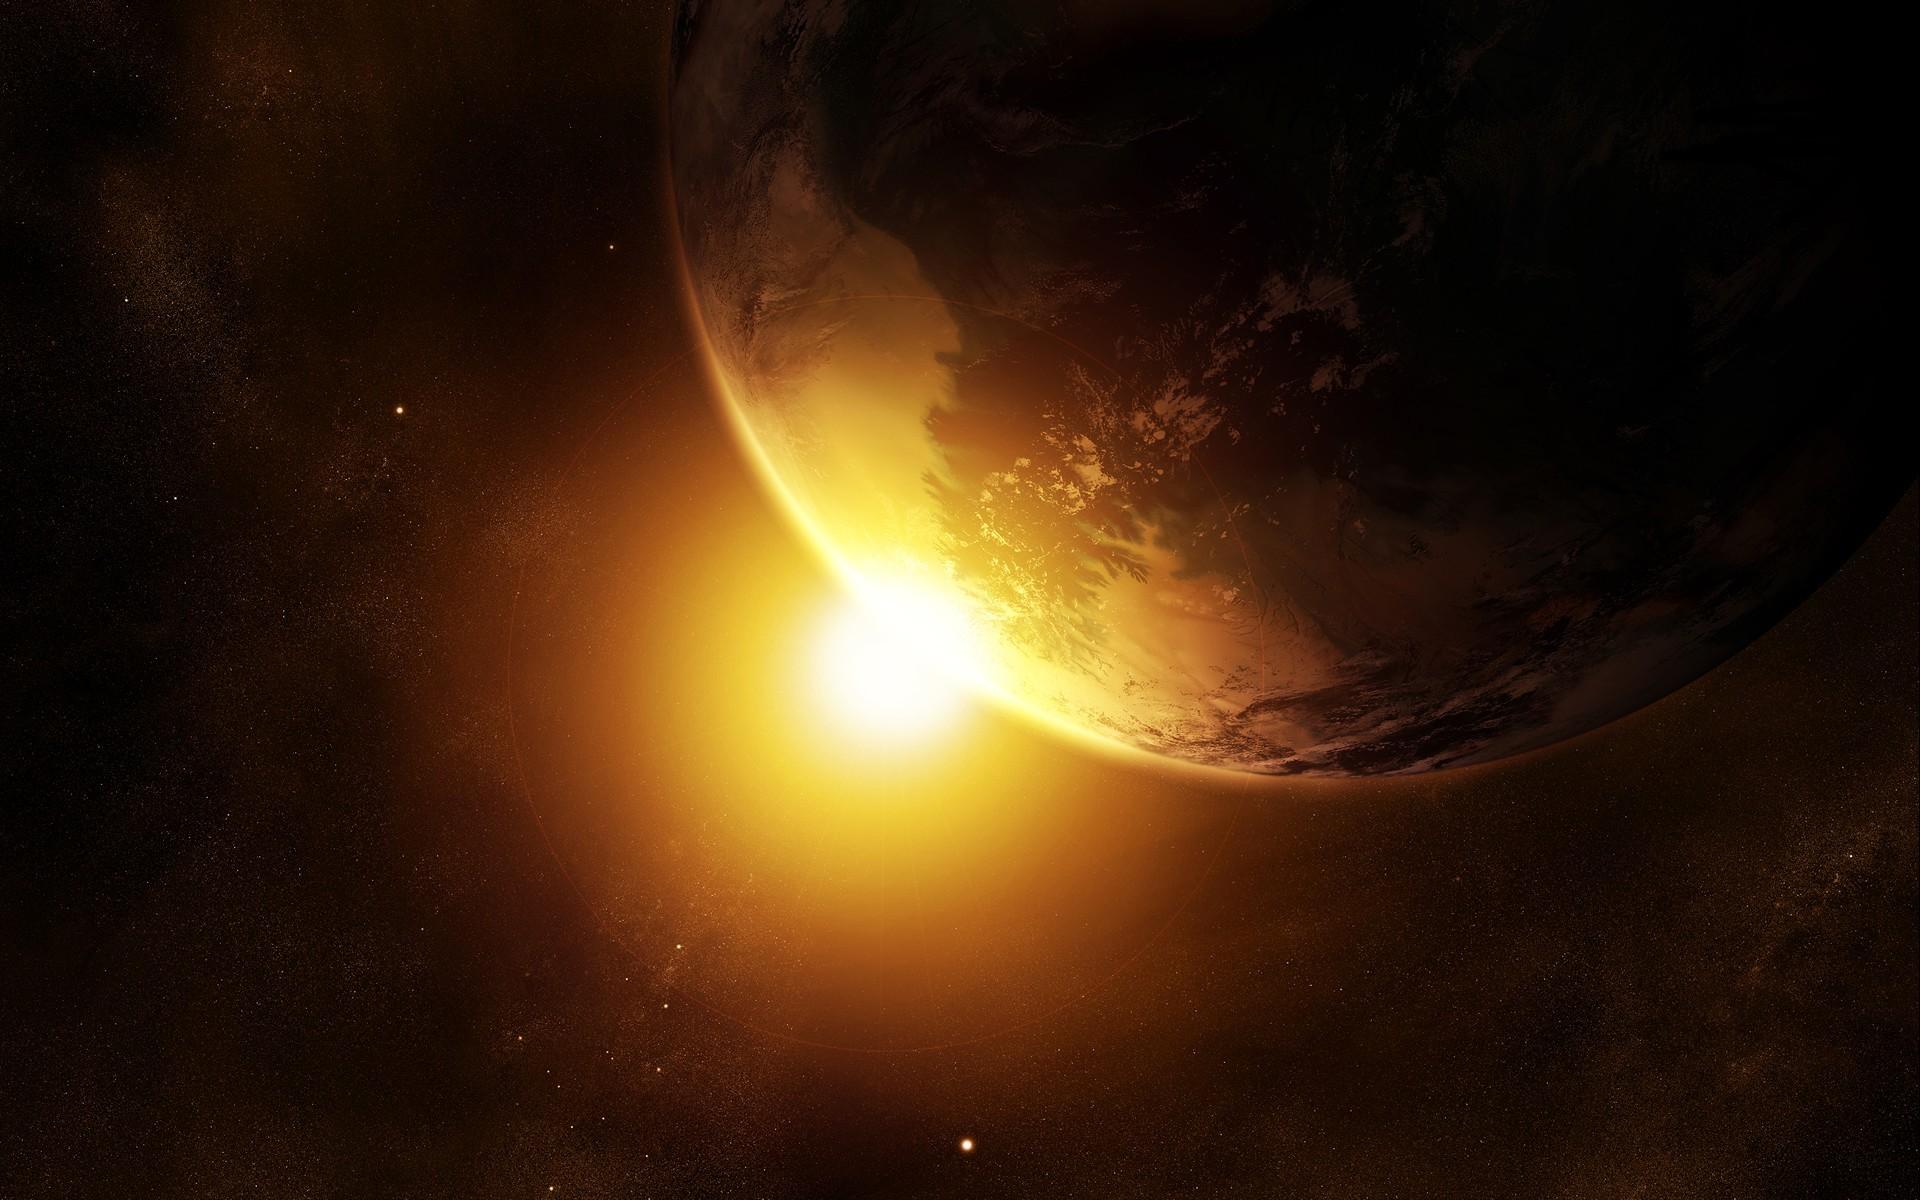 General 1920x1200 Sun space Earth space art planet digital art